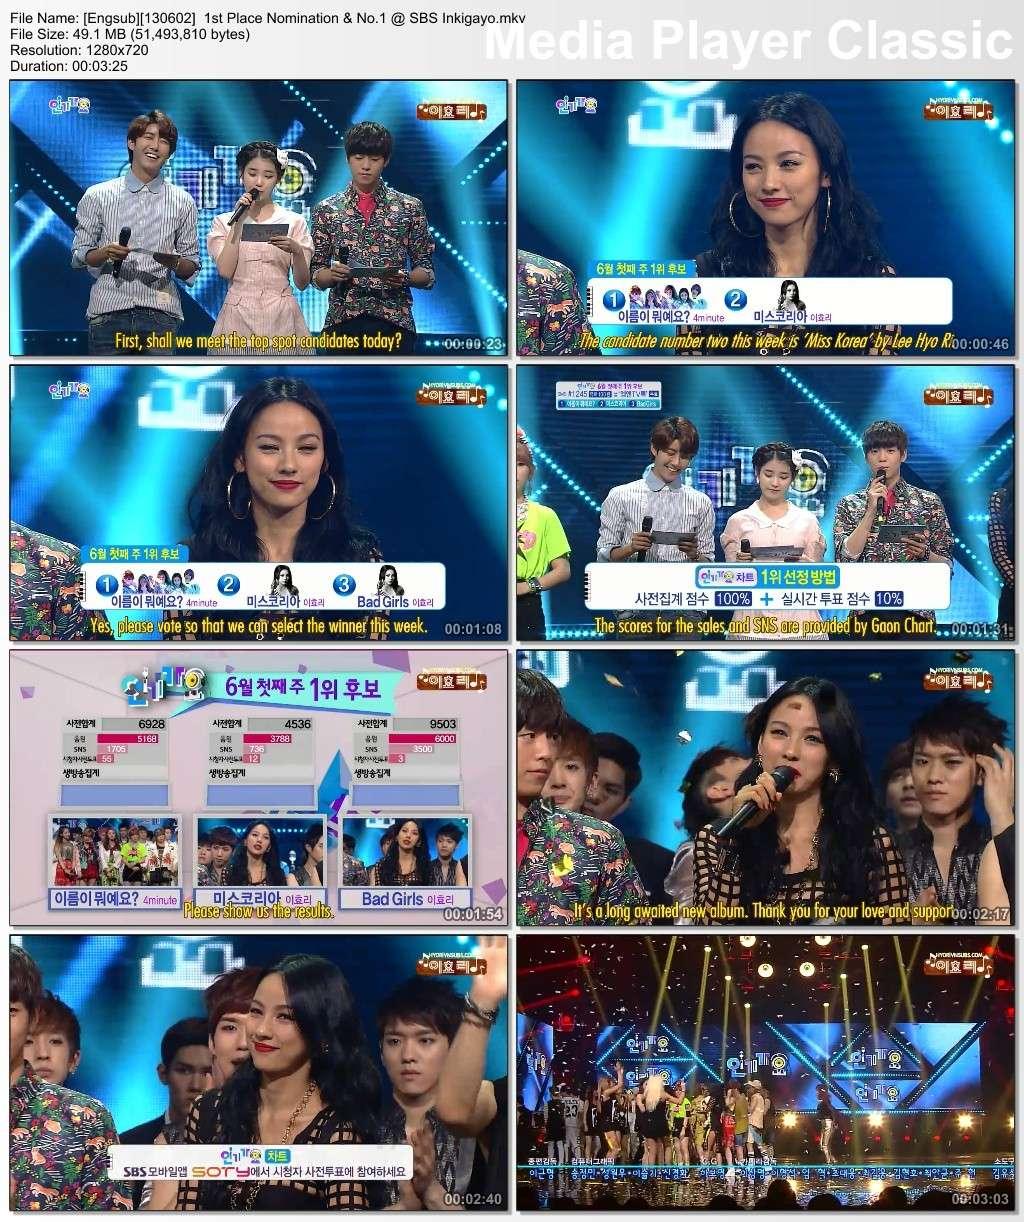 [Engsub][130602] 1st Place Nomination & No.1 @ SBS Inkigayo Engsub16